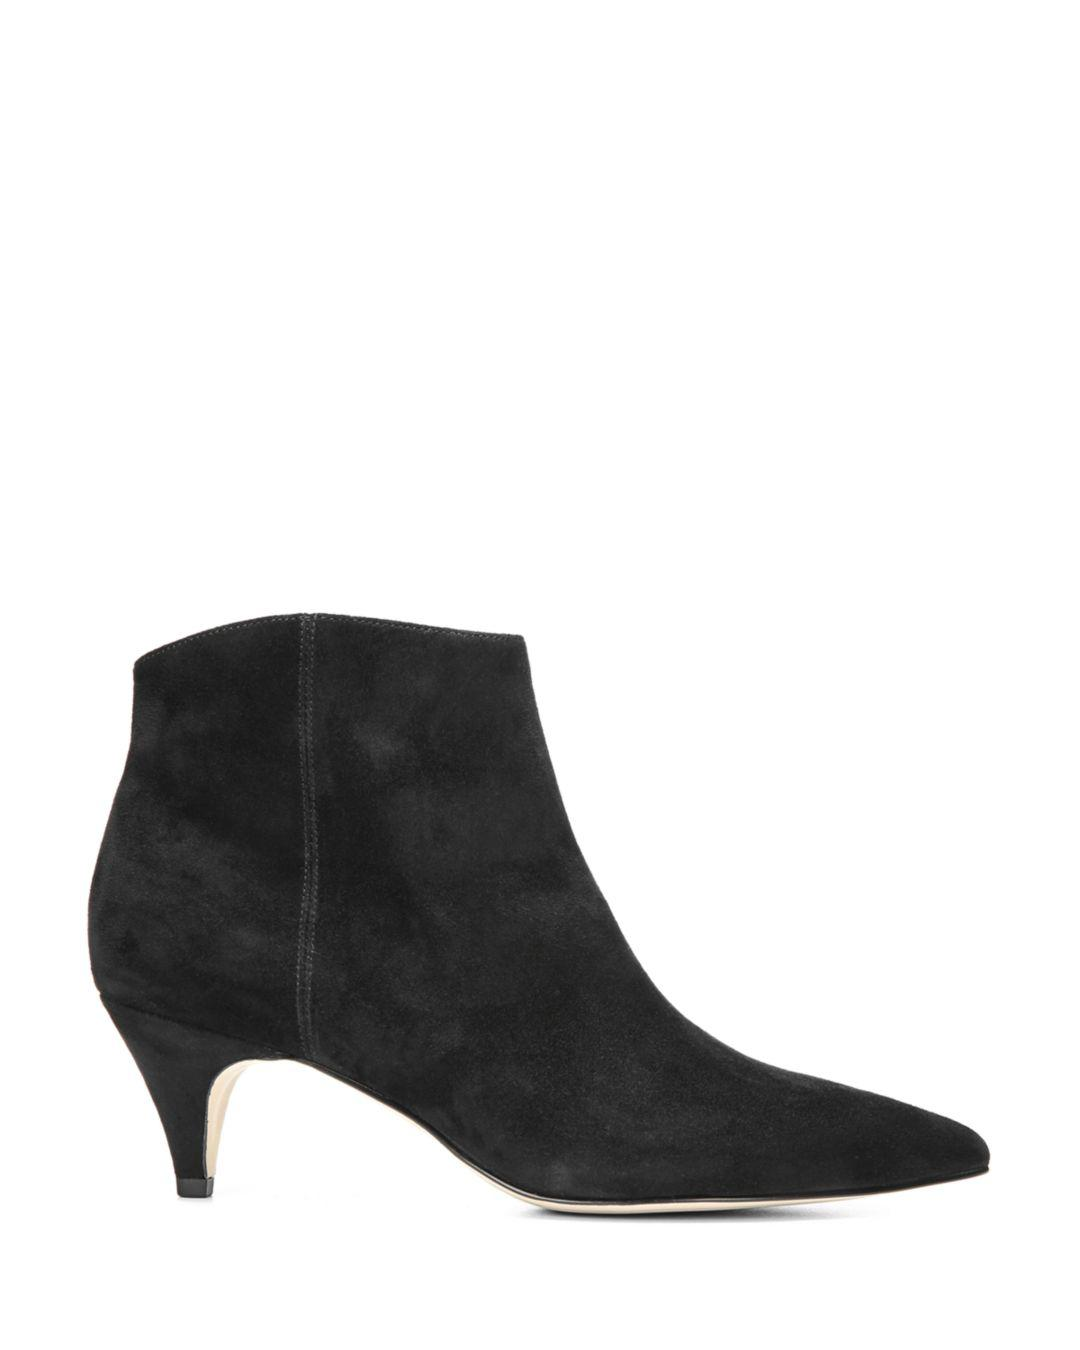 9853e7712ca45 Lyst - Sam Edelman Women s Kinzey Kitten-heel Booties in Black